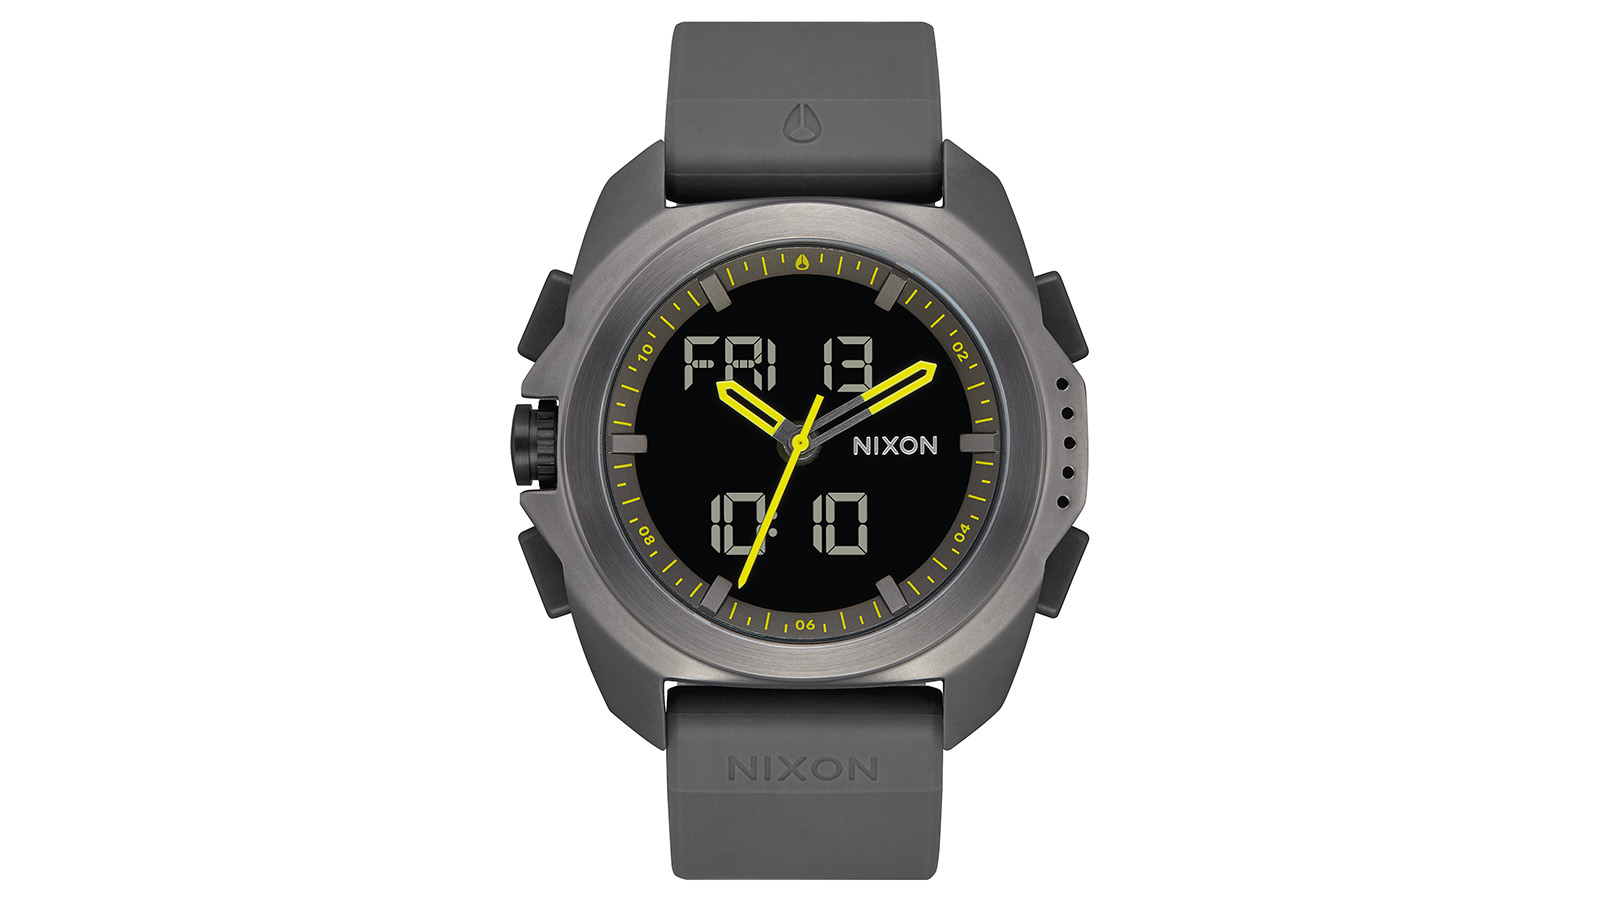 NIXON SS20 Watches